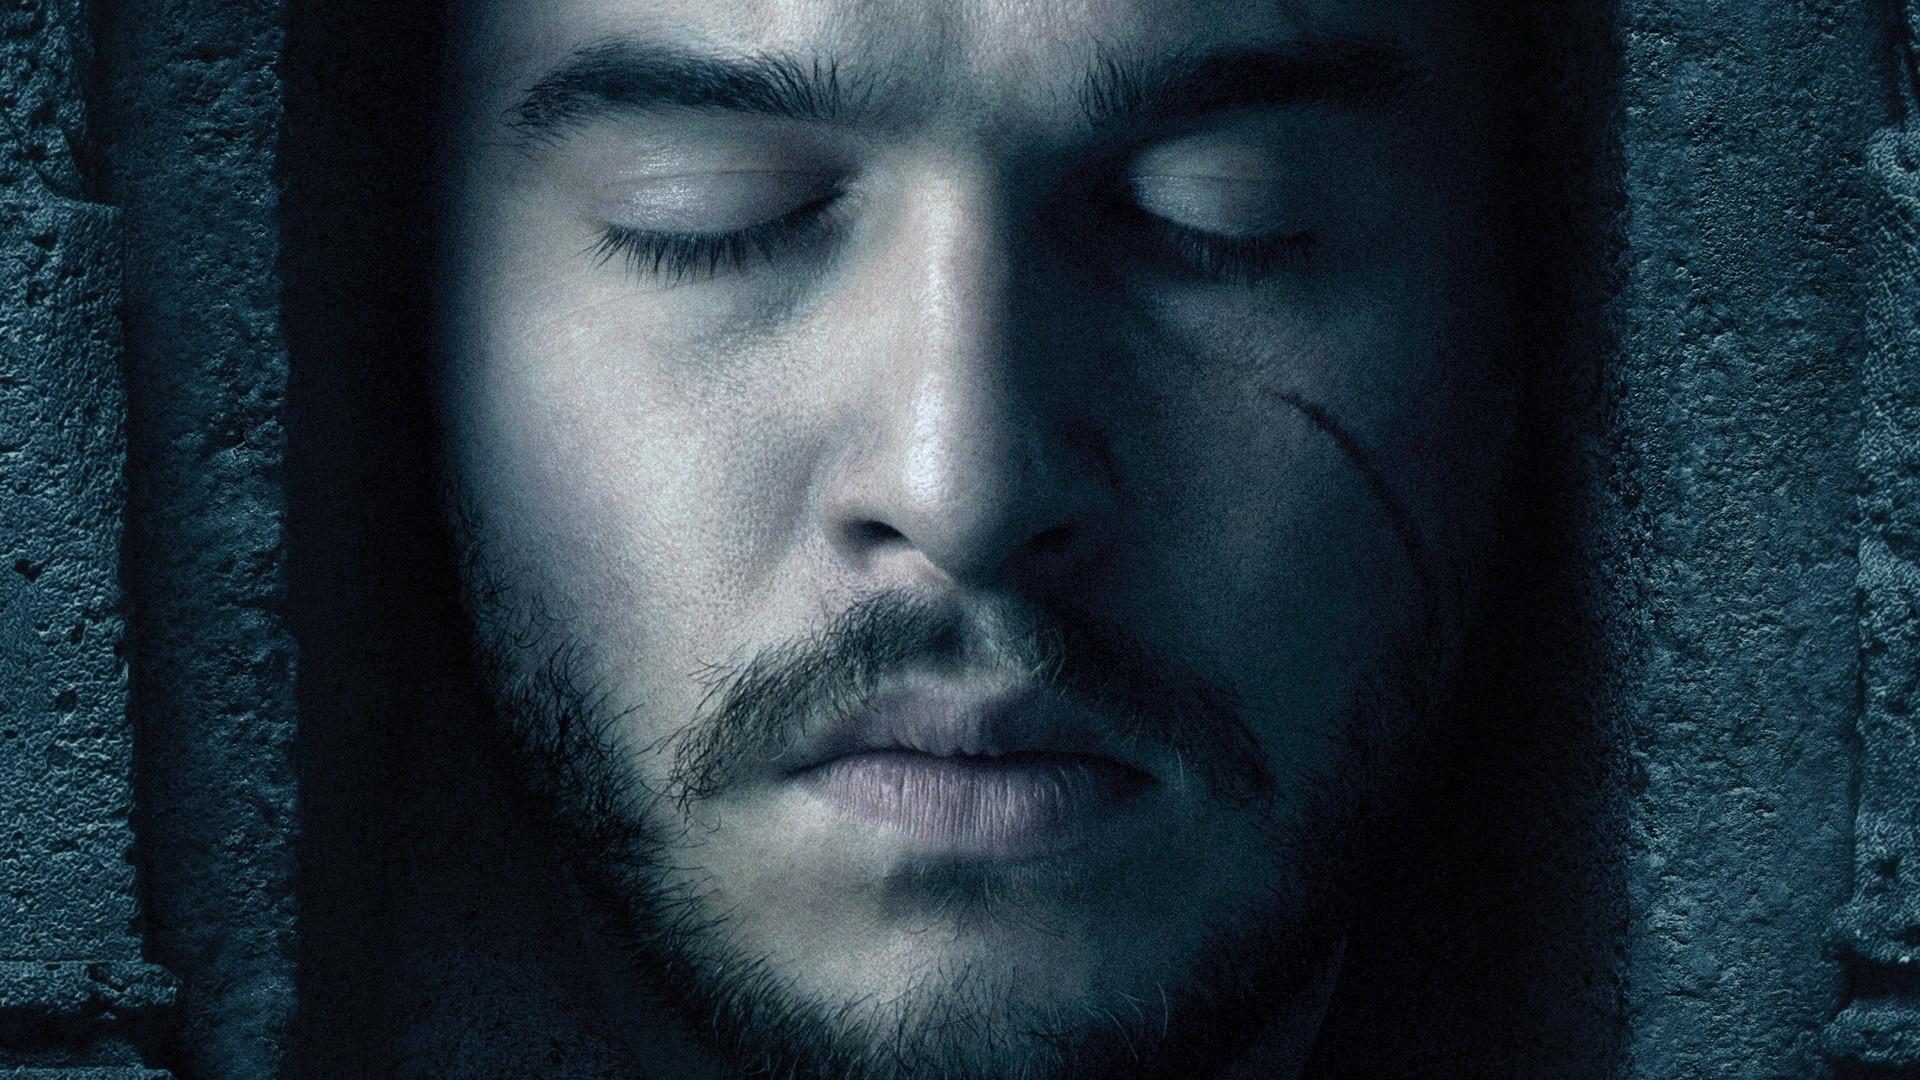 Kit Harington, Game of Thrones, Jon Snow wallpaper thumb